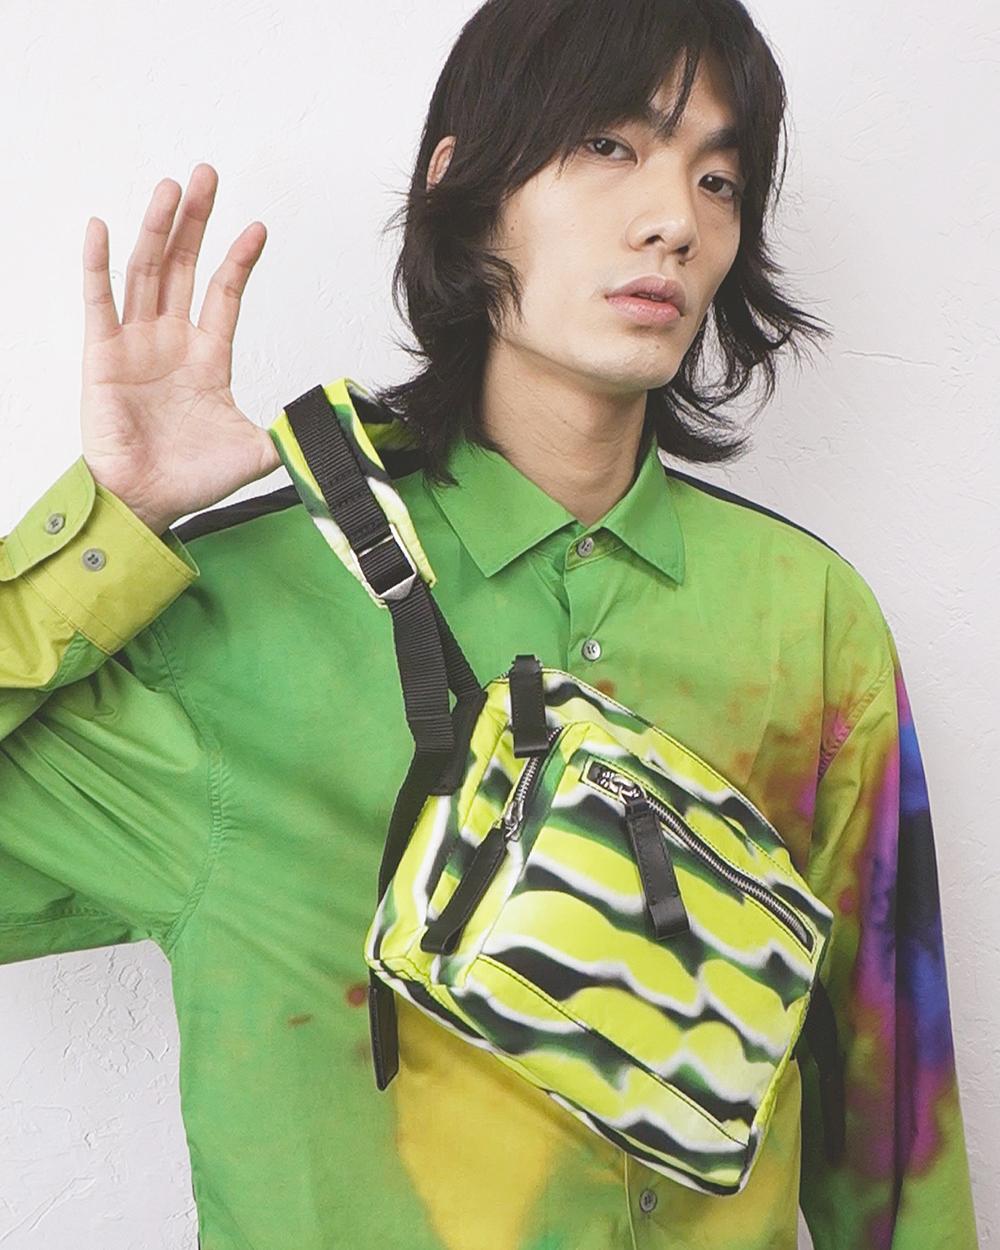 Ron Wan for JOYCE Spot Hong Kong Featuring Dries Van Noten Menswear